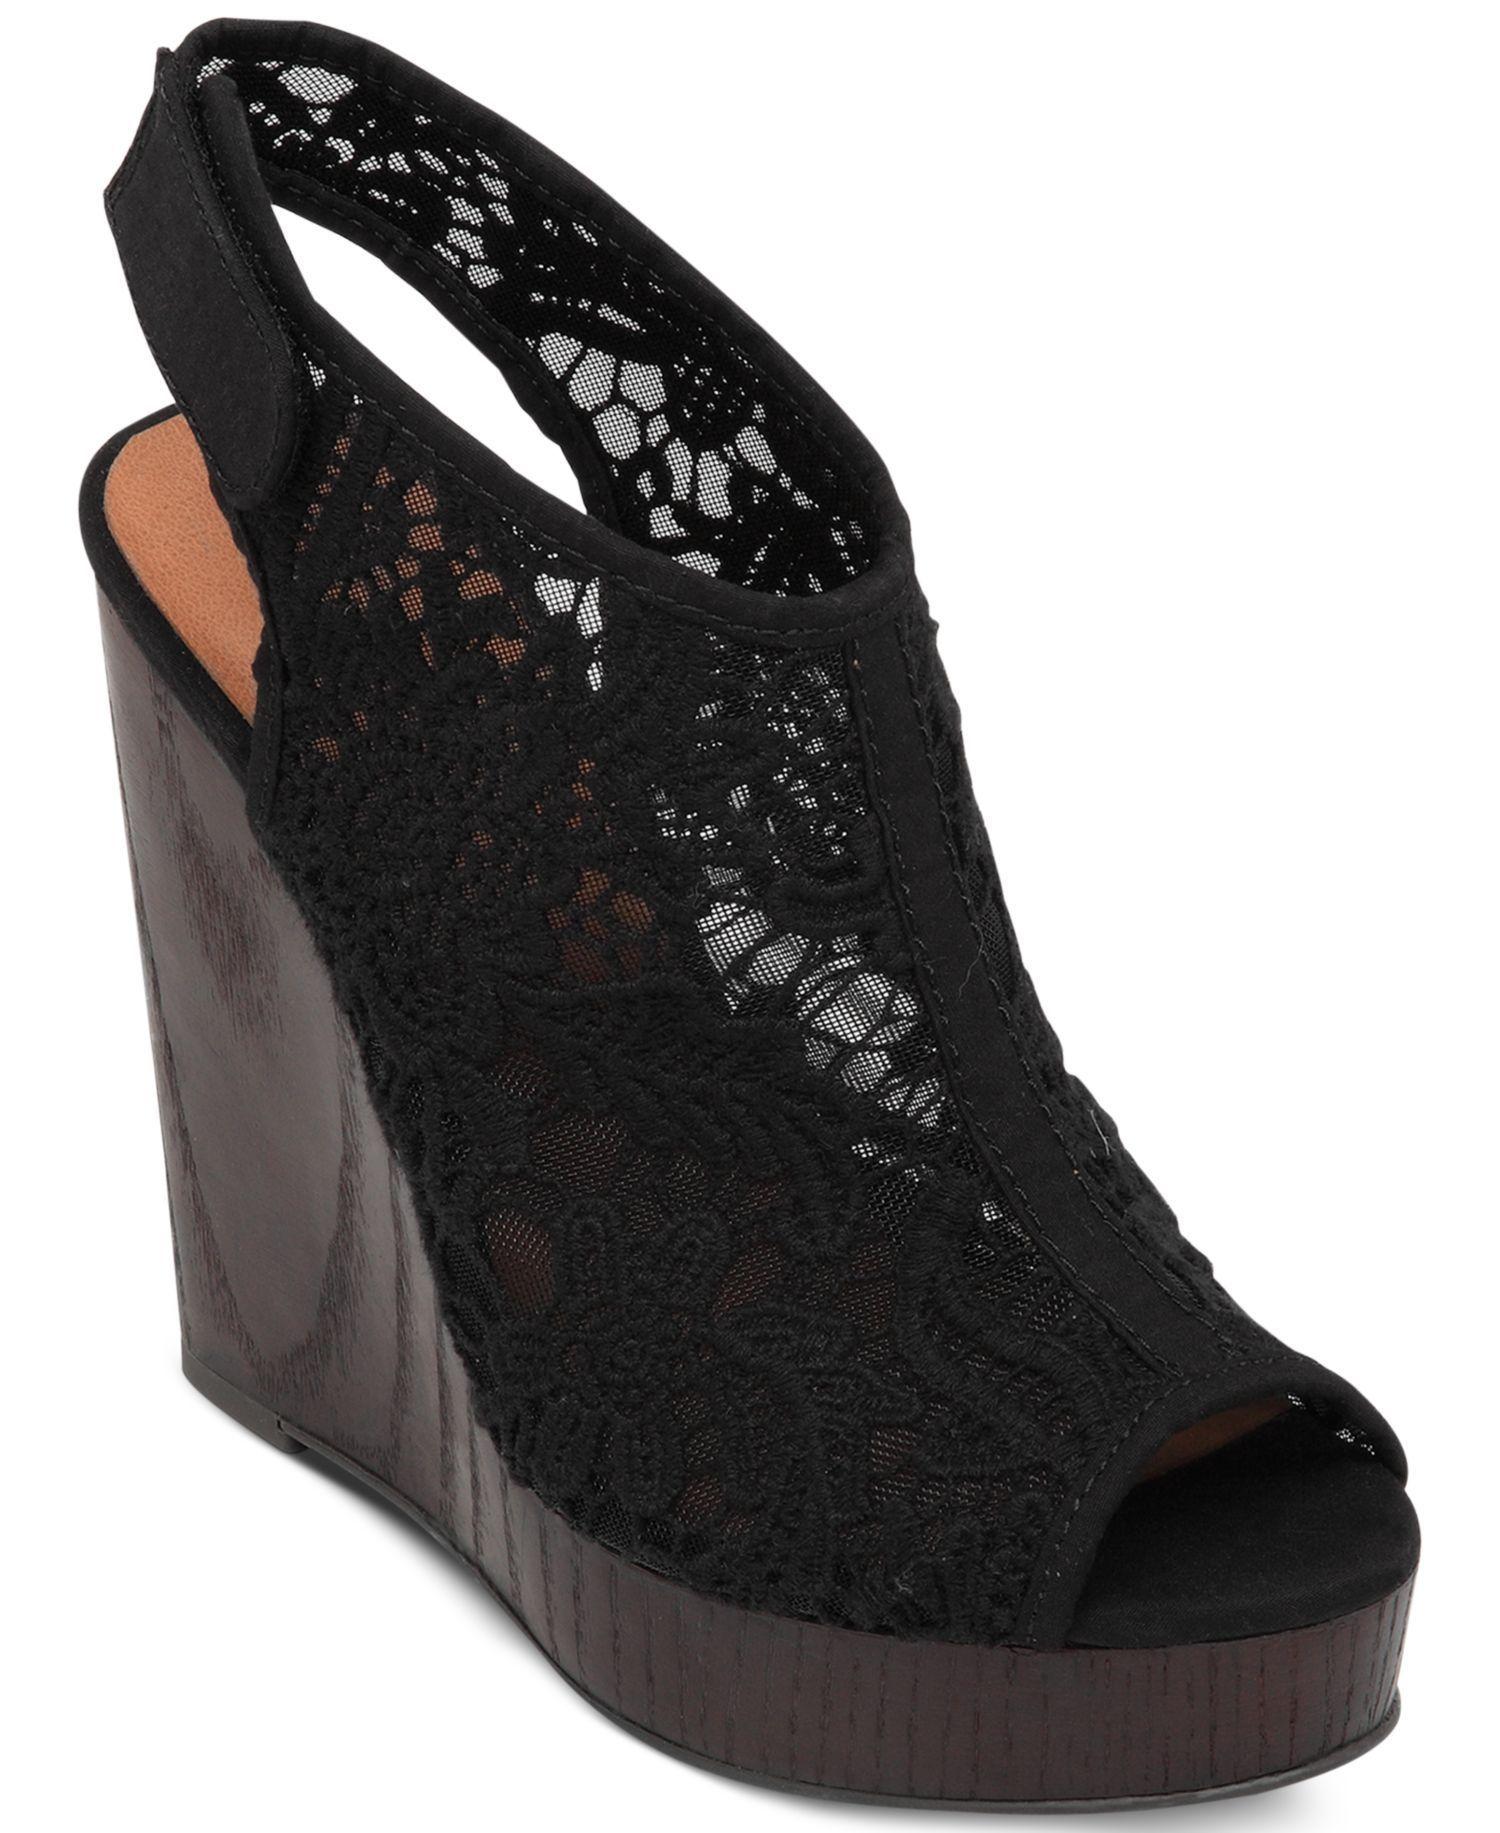 dae07e5d875 Women s Rezdah2 Crochet Platform Wedge Sandals by Lucky Brand - Found on  HeartThis.com